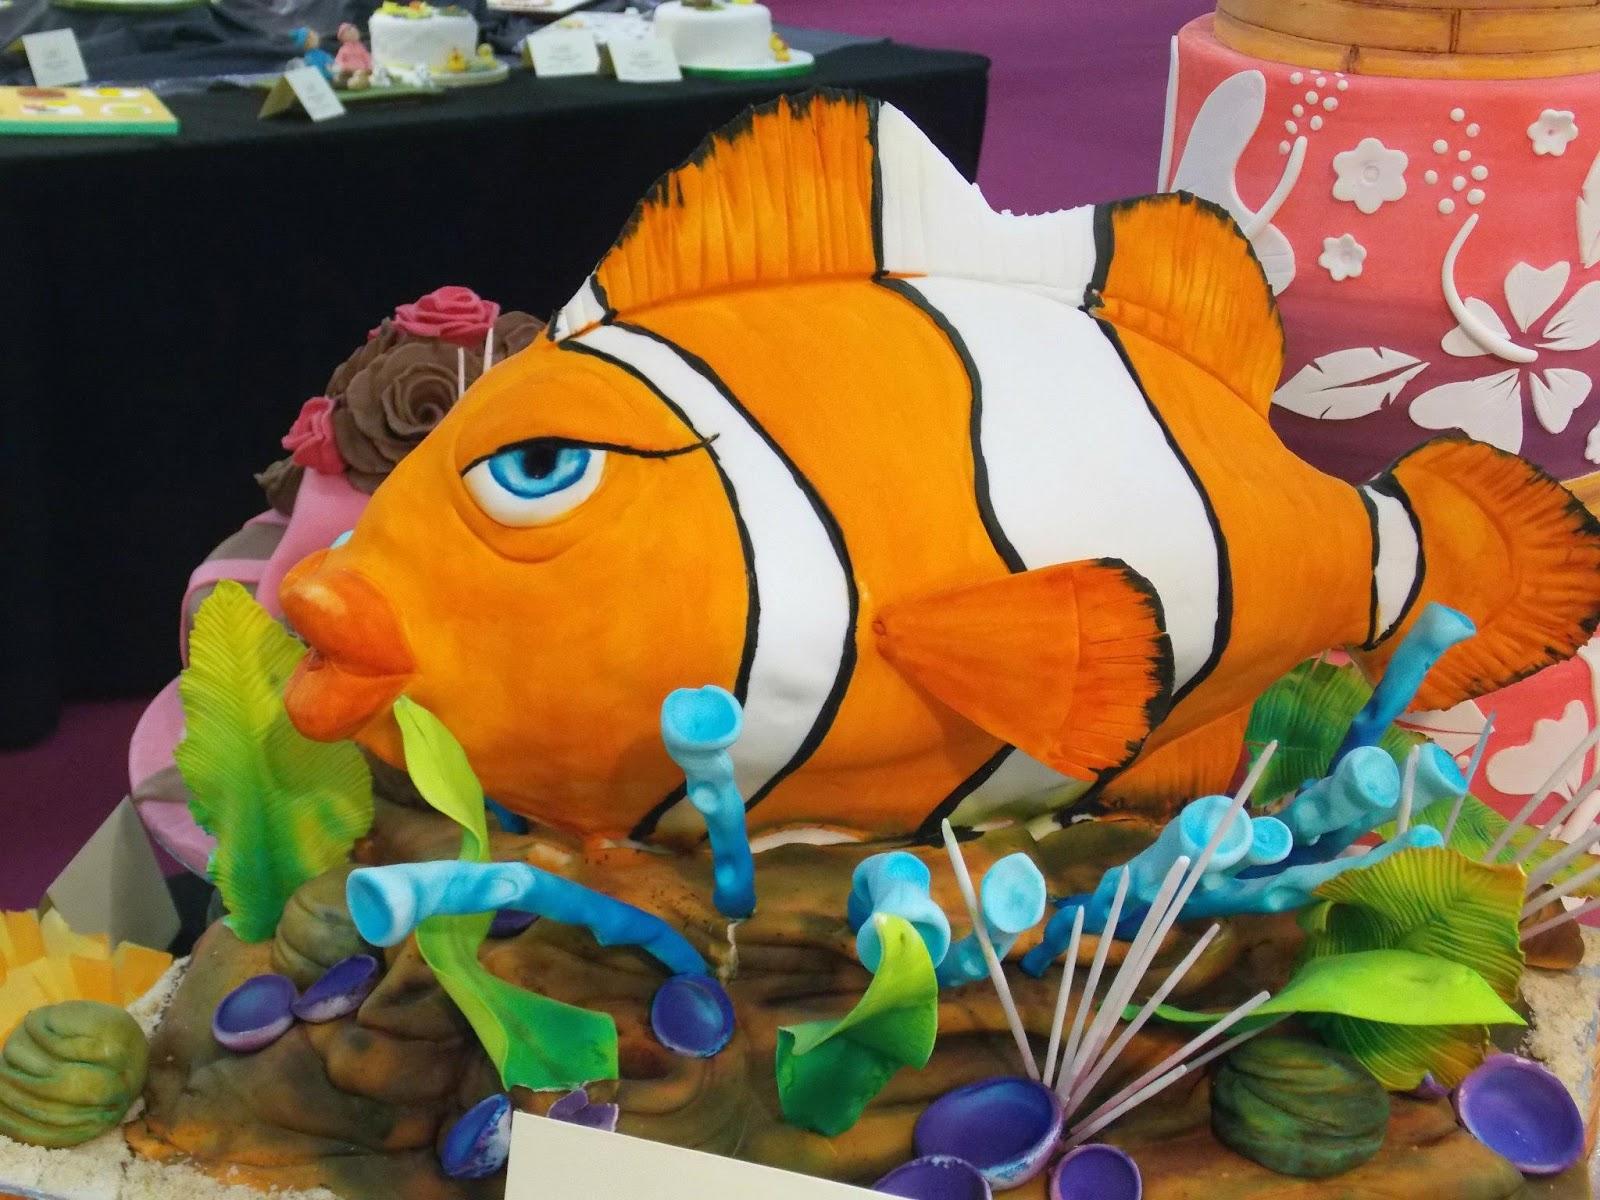 Specialist Cake Decorating Supplies